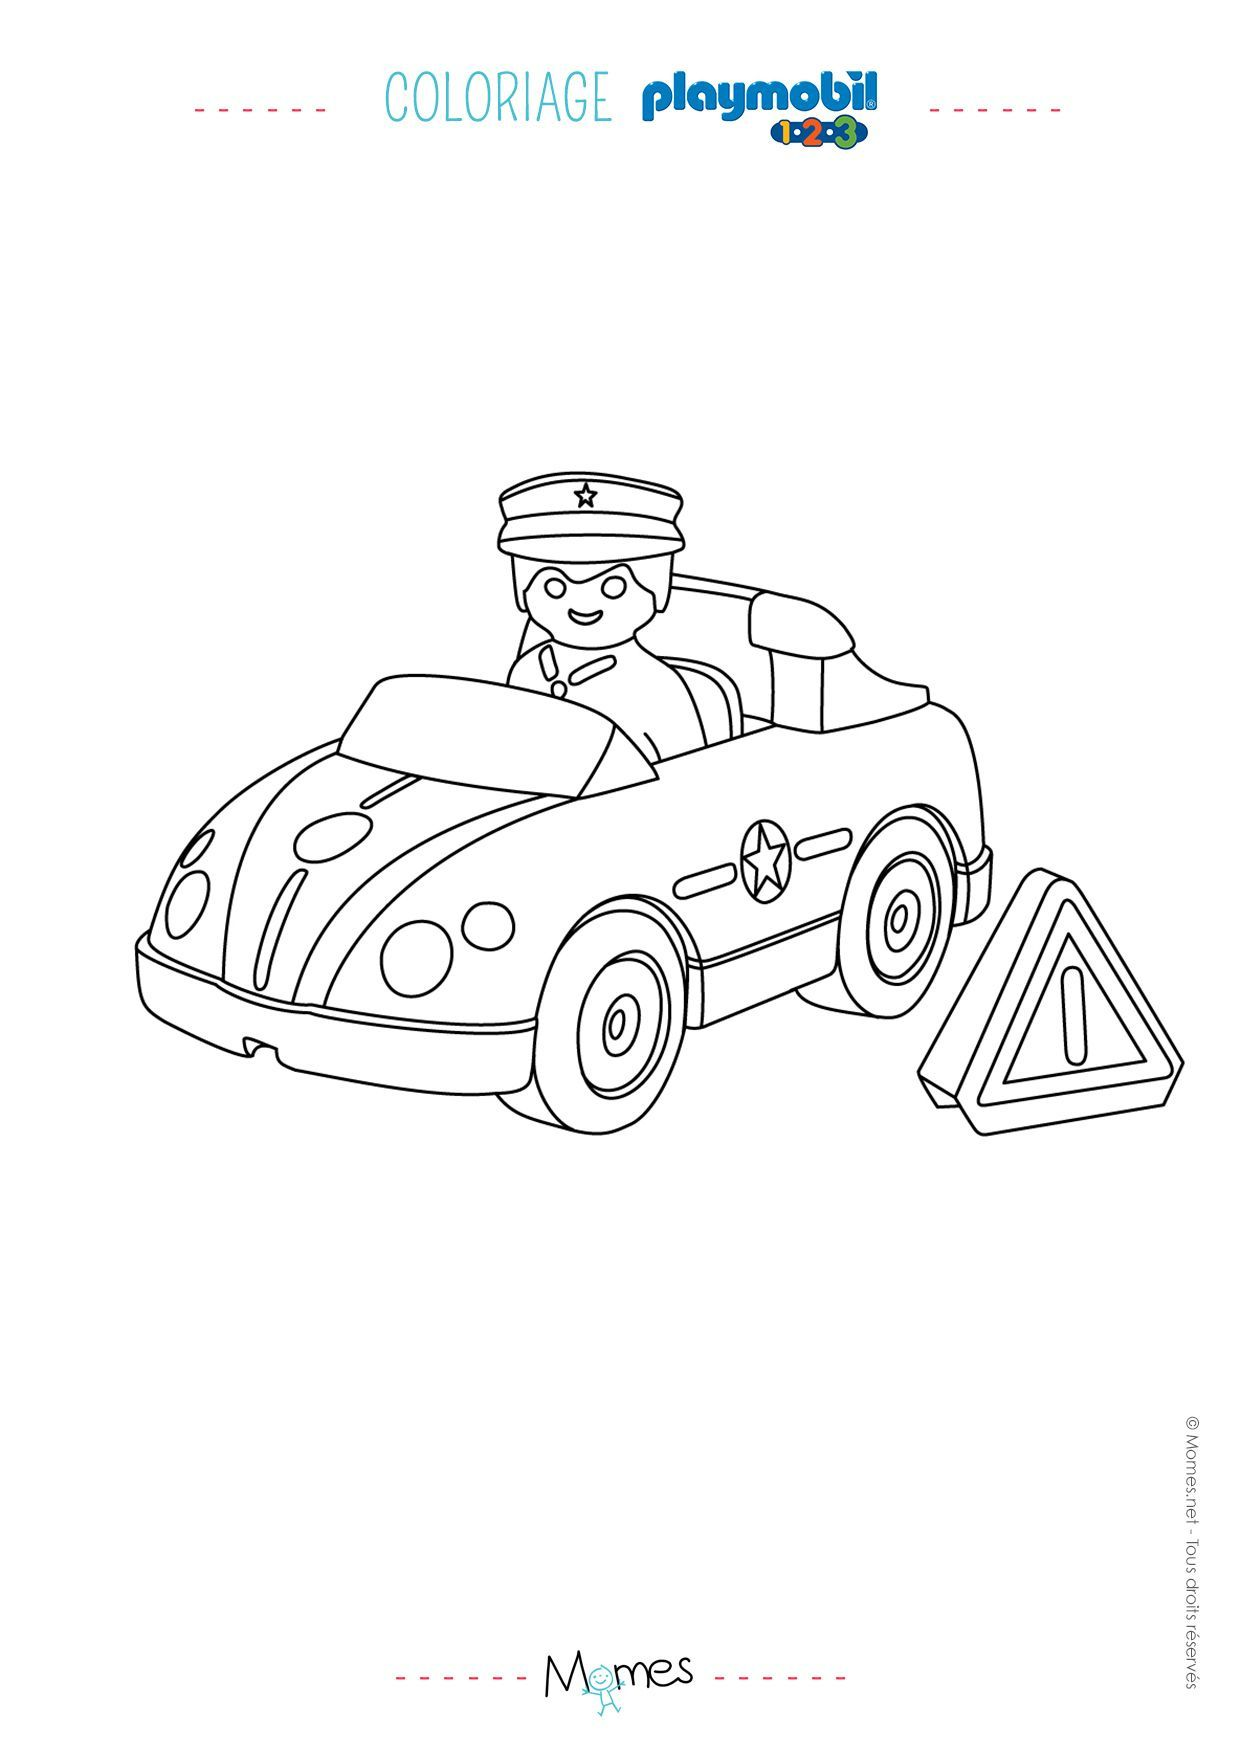 Coloriage Playmobil Licorne